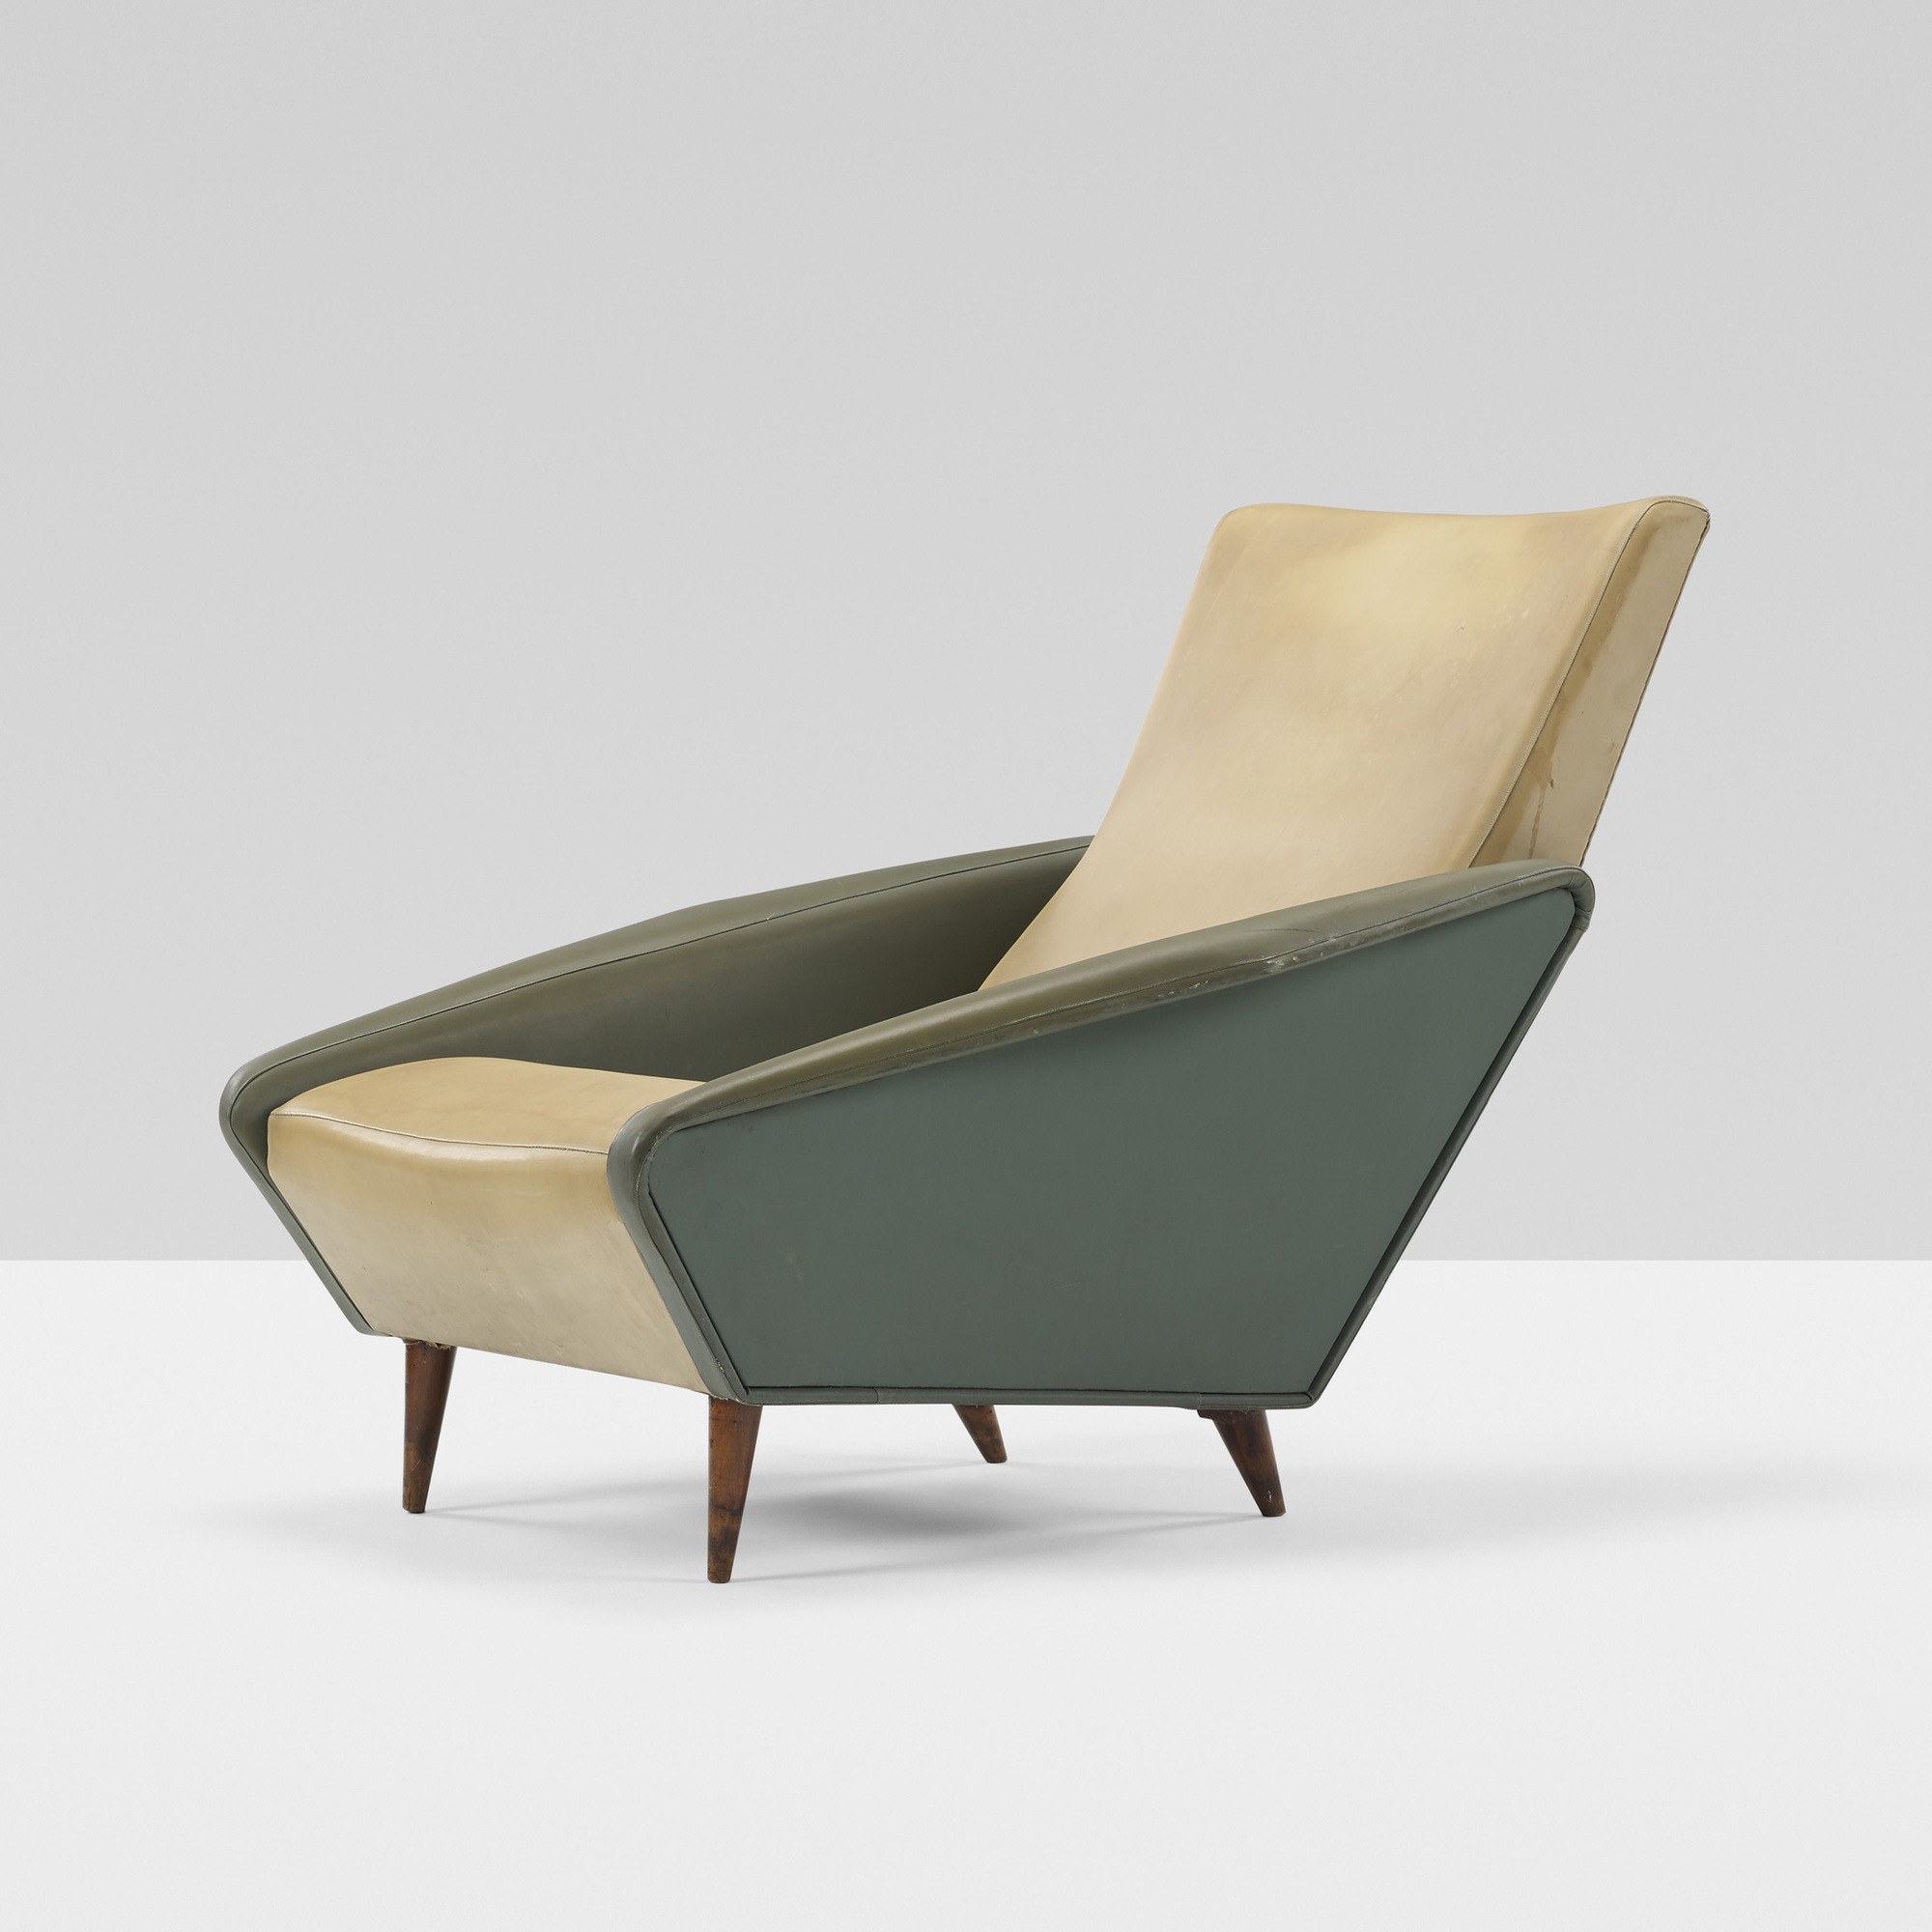 248 GIO PONTI Distex lounge chair model 807